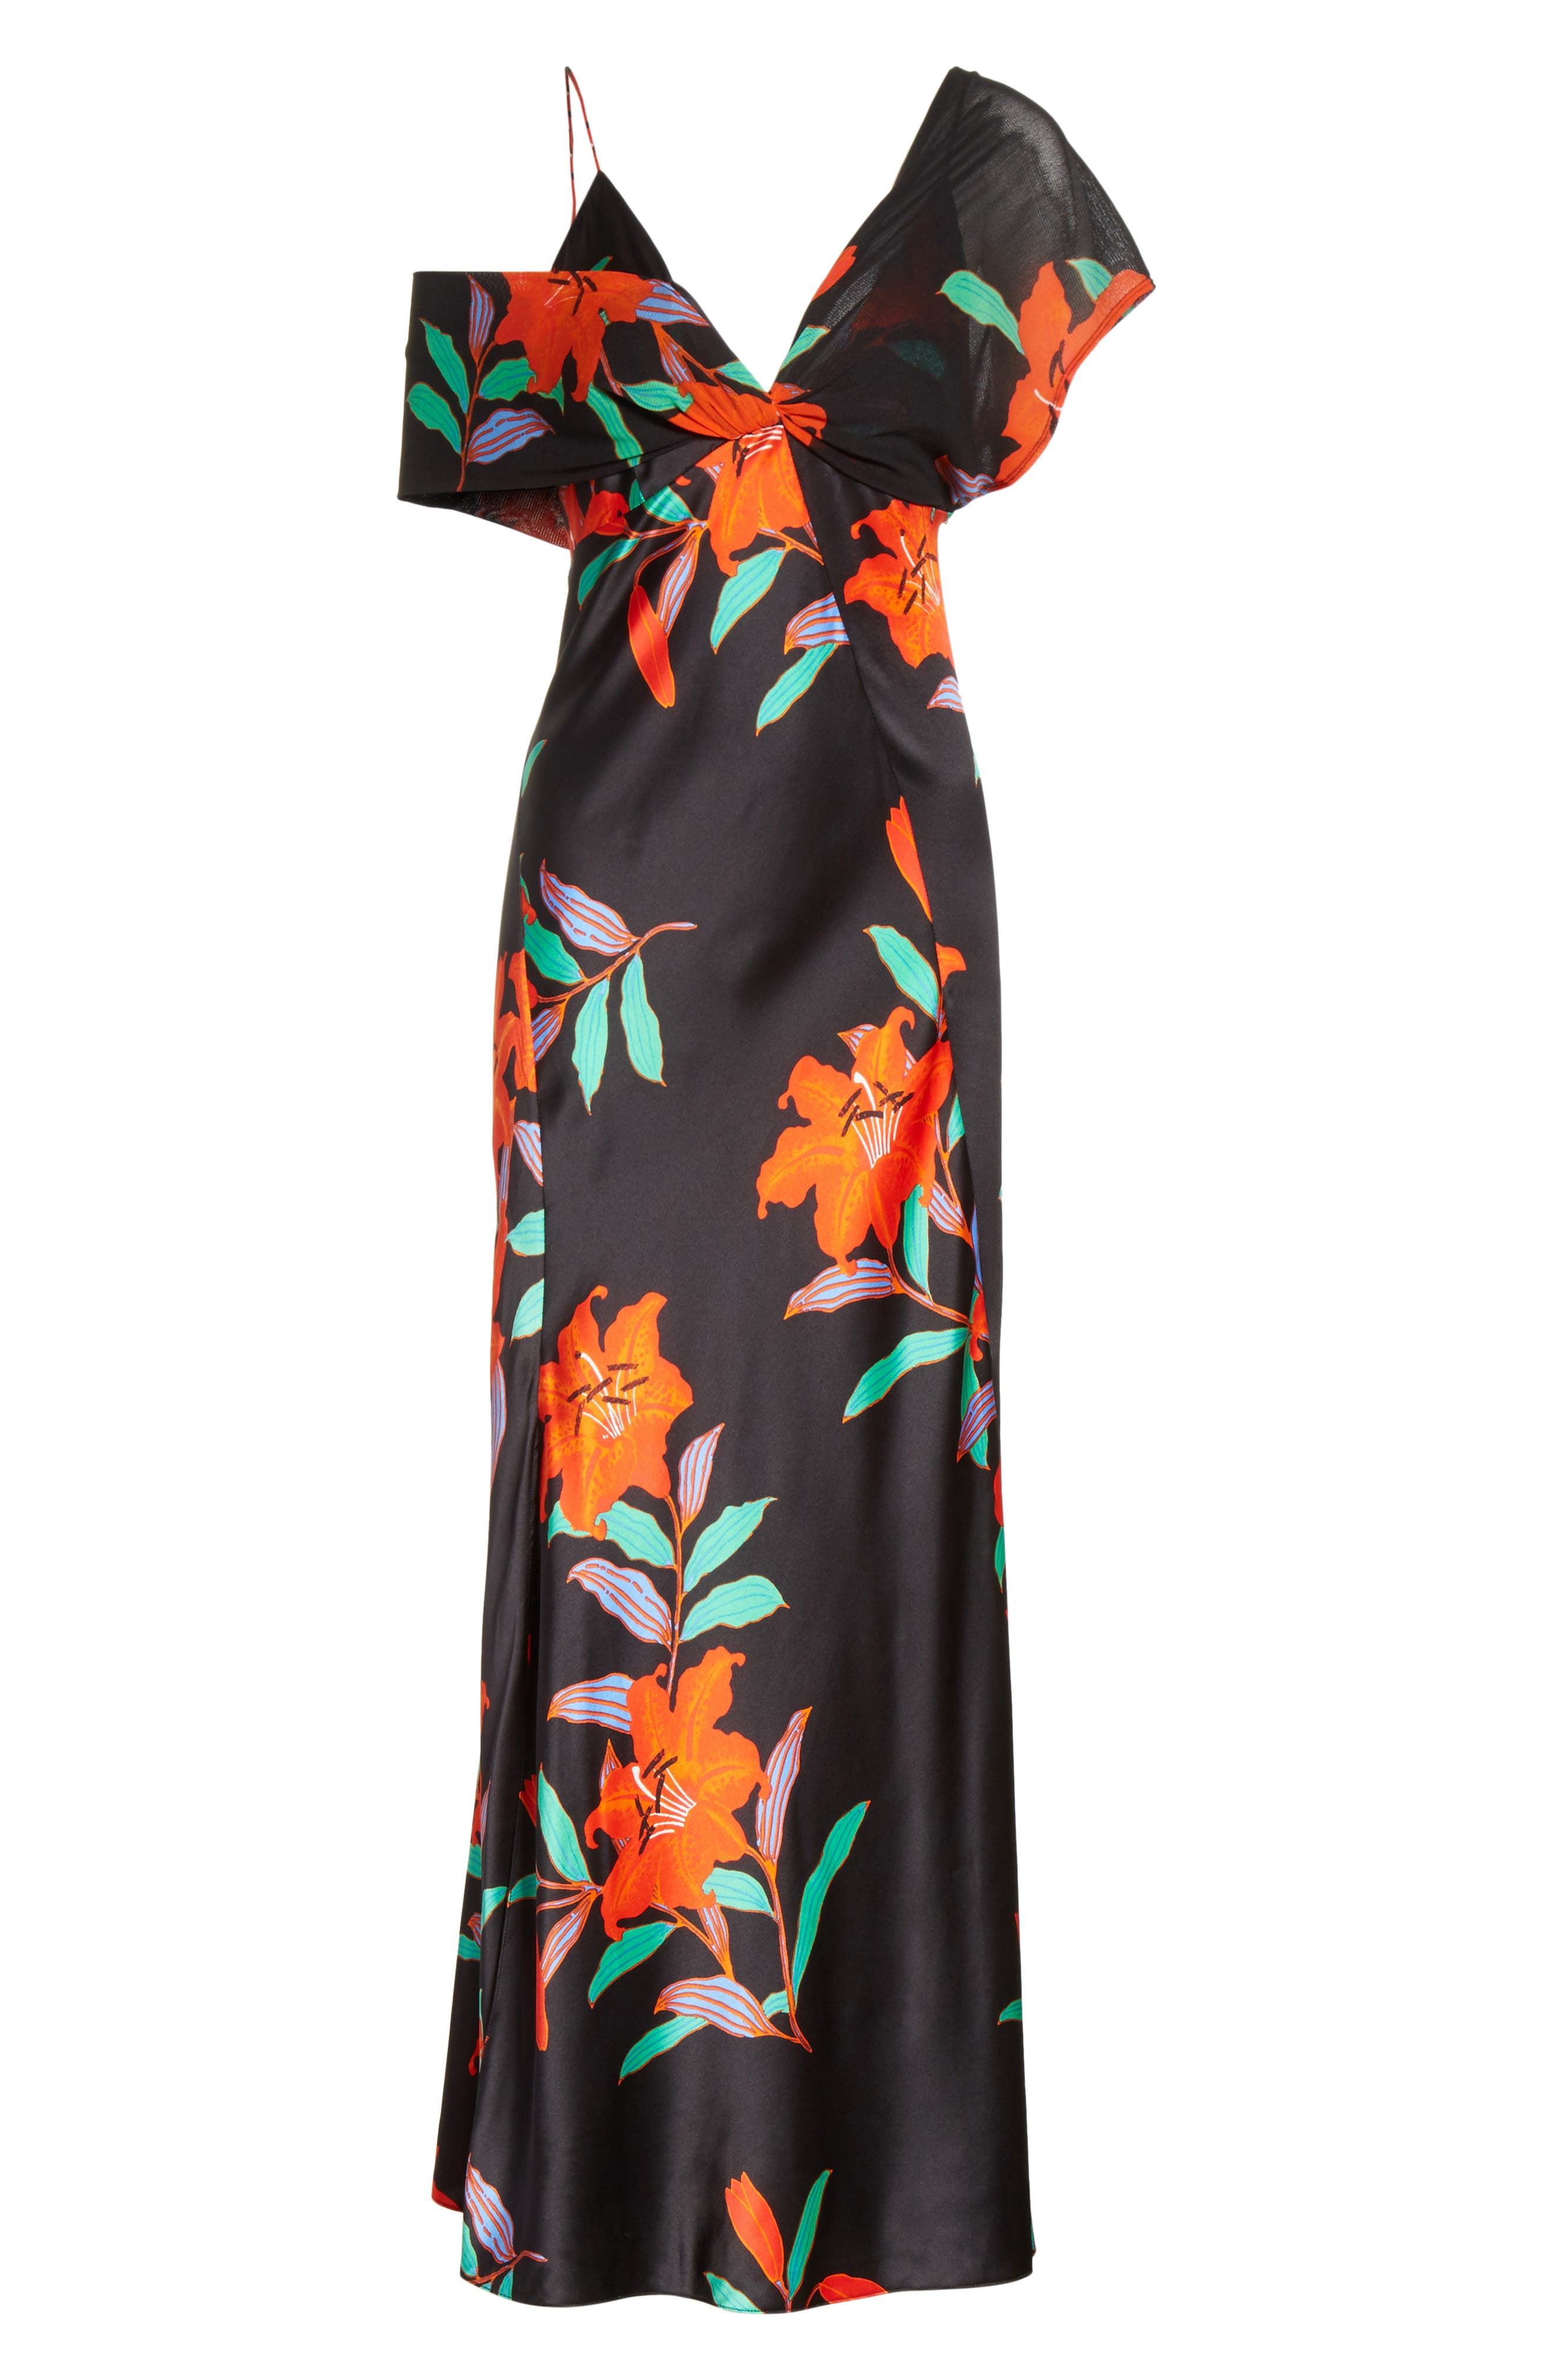 Diane von Furstenberg Asymmetrical Knotted Gown,                             Alternate thumbnail 6, color,                             Argos Black